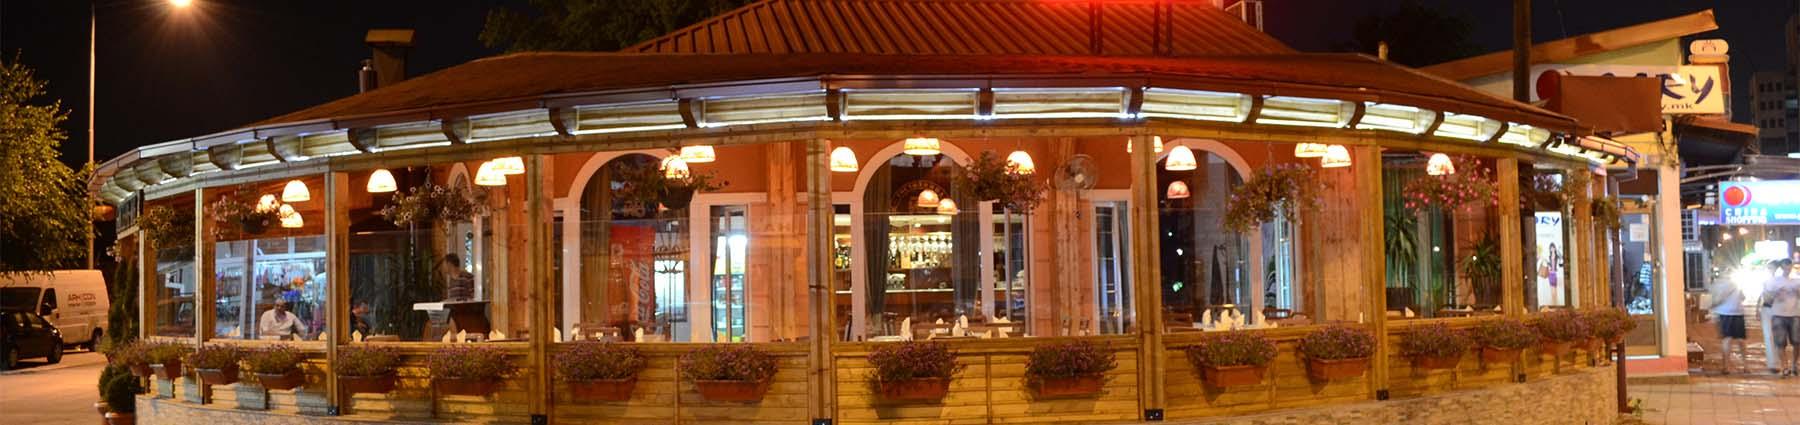 Restaurant Bisera Iv